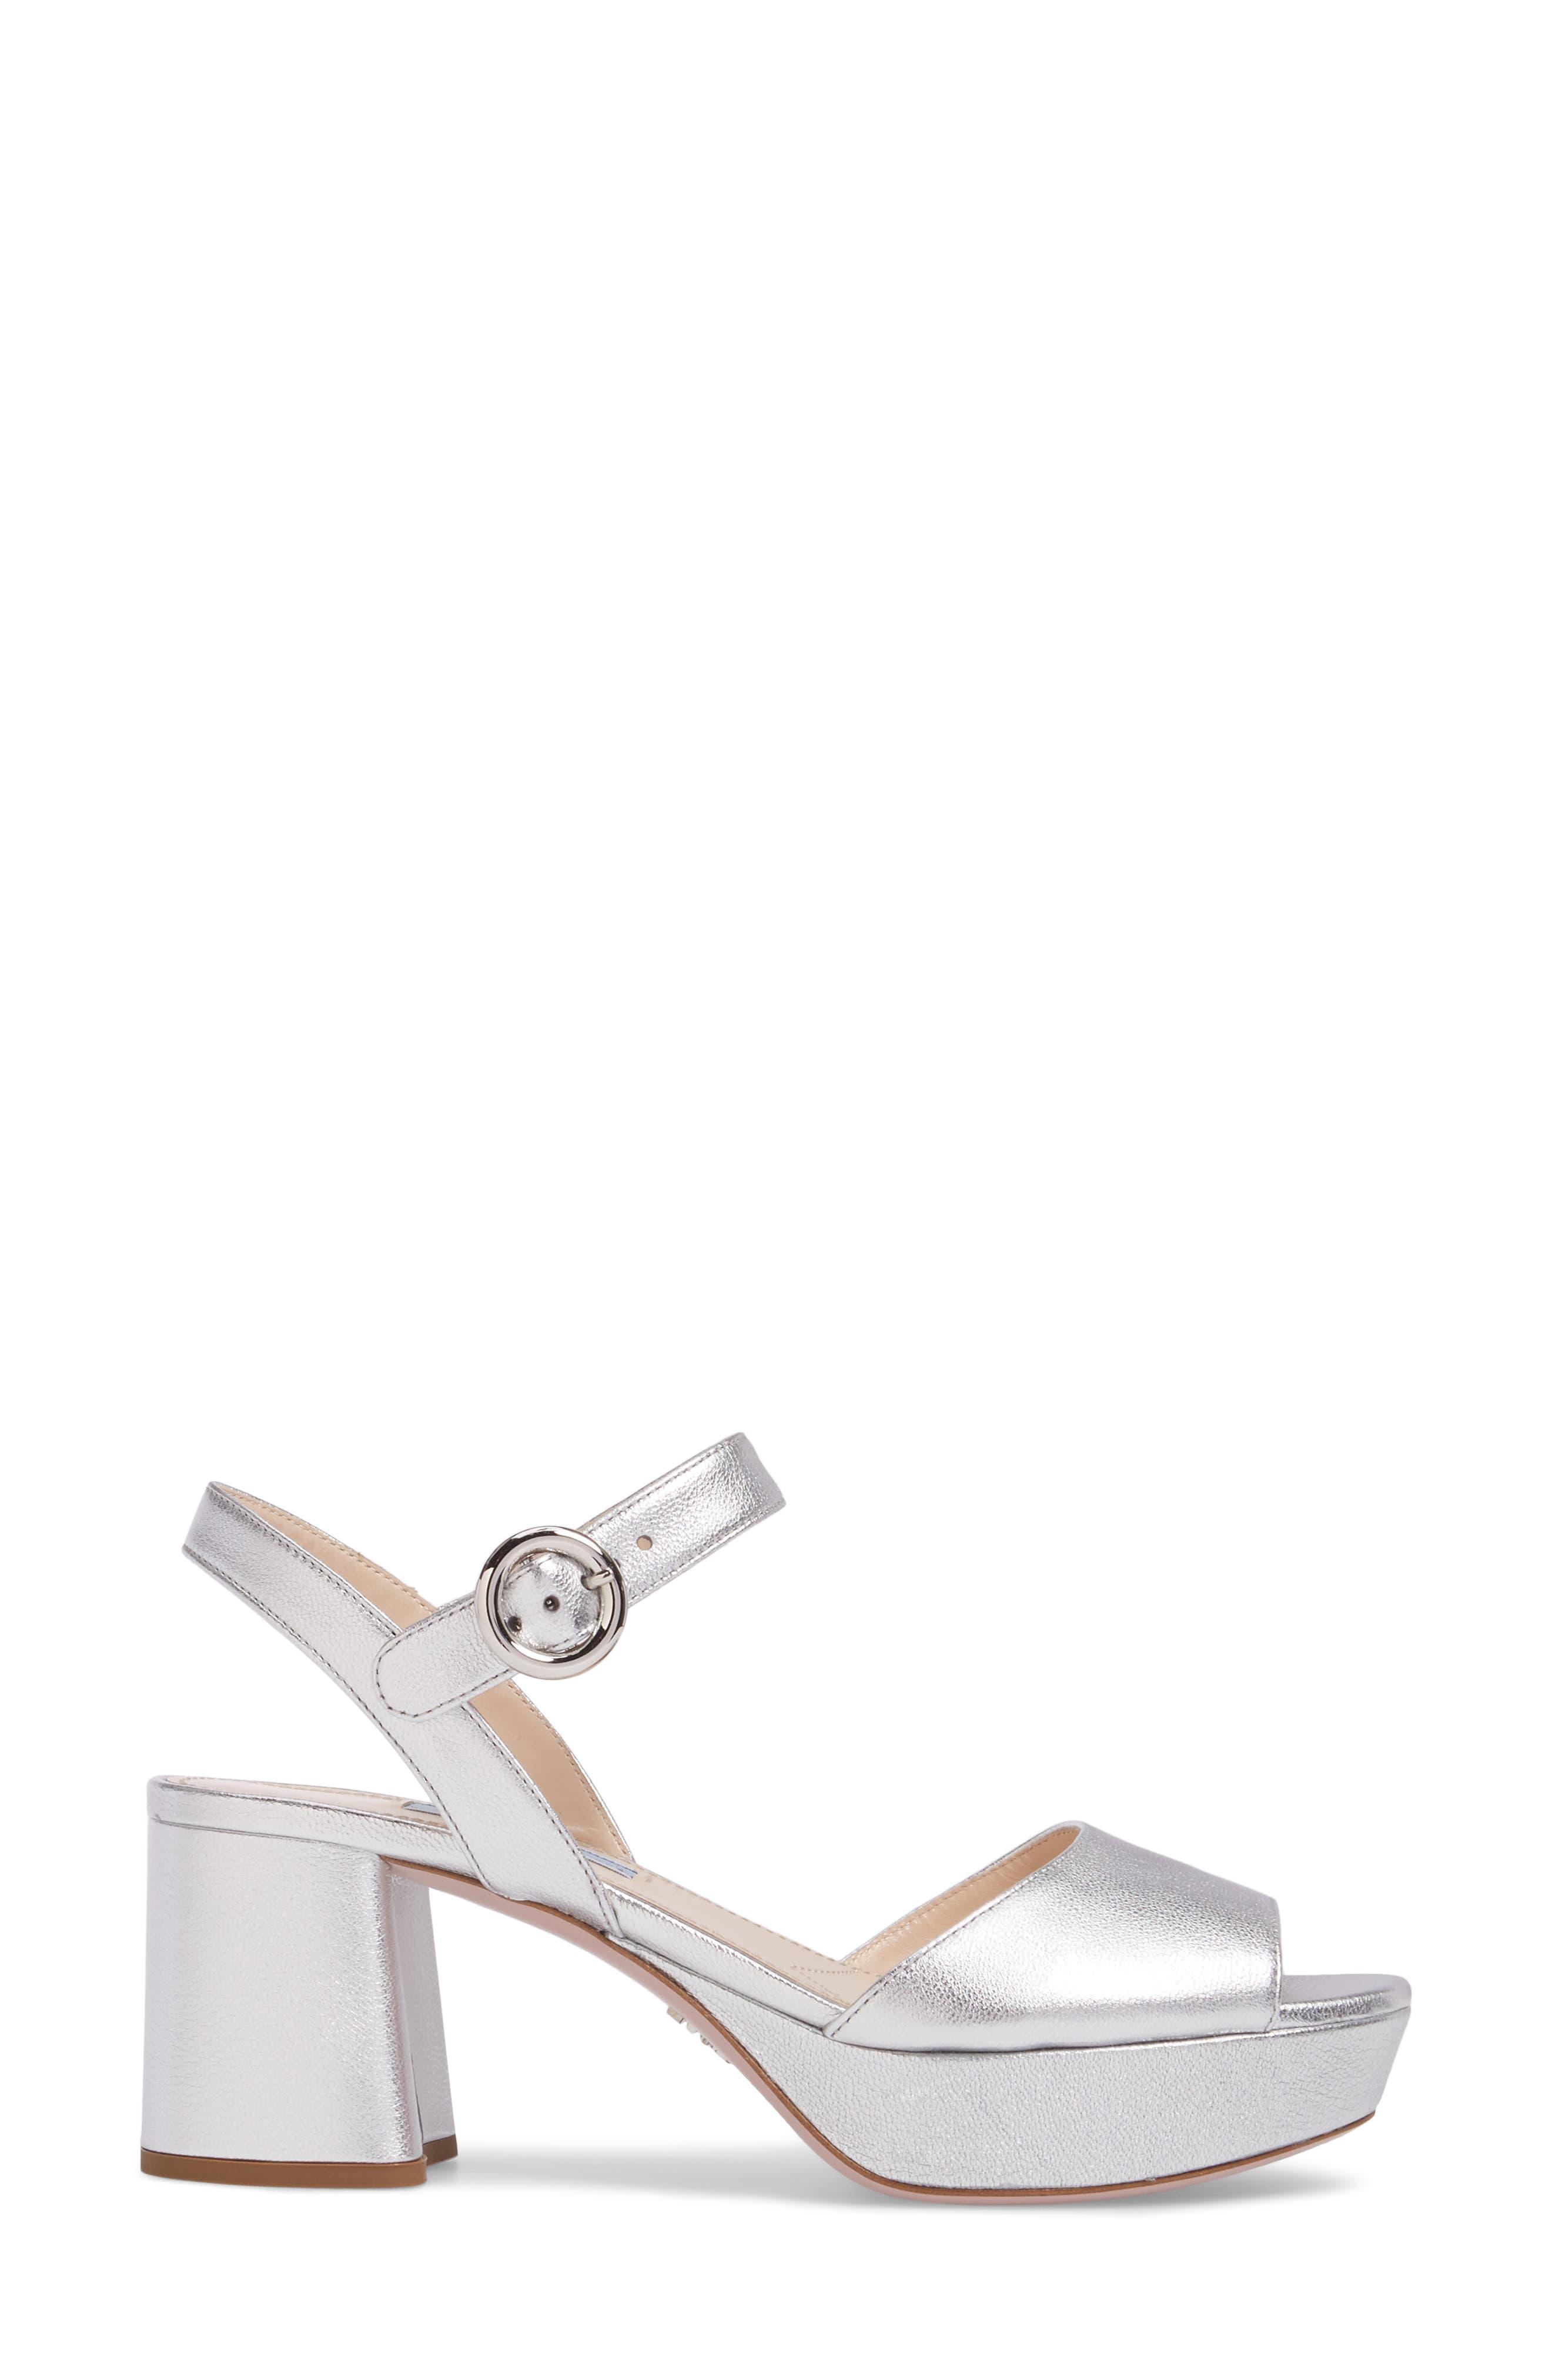 Ankle Strap Platform Sandal,                             Alternate thumbnail 3, color,                             Silver